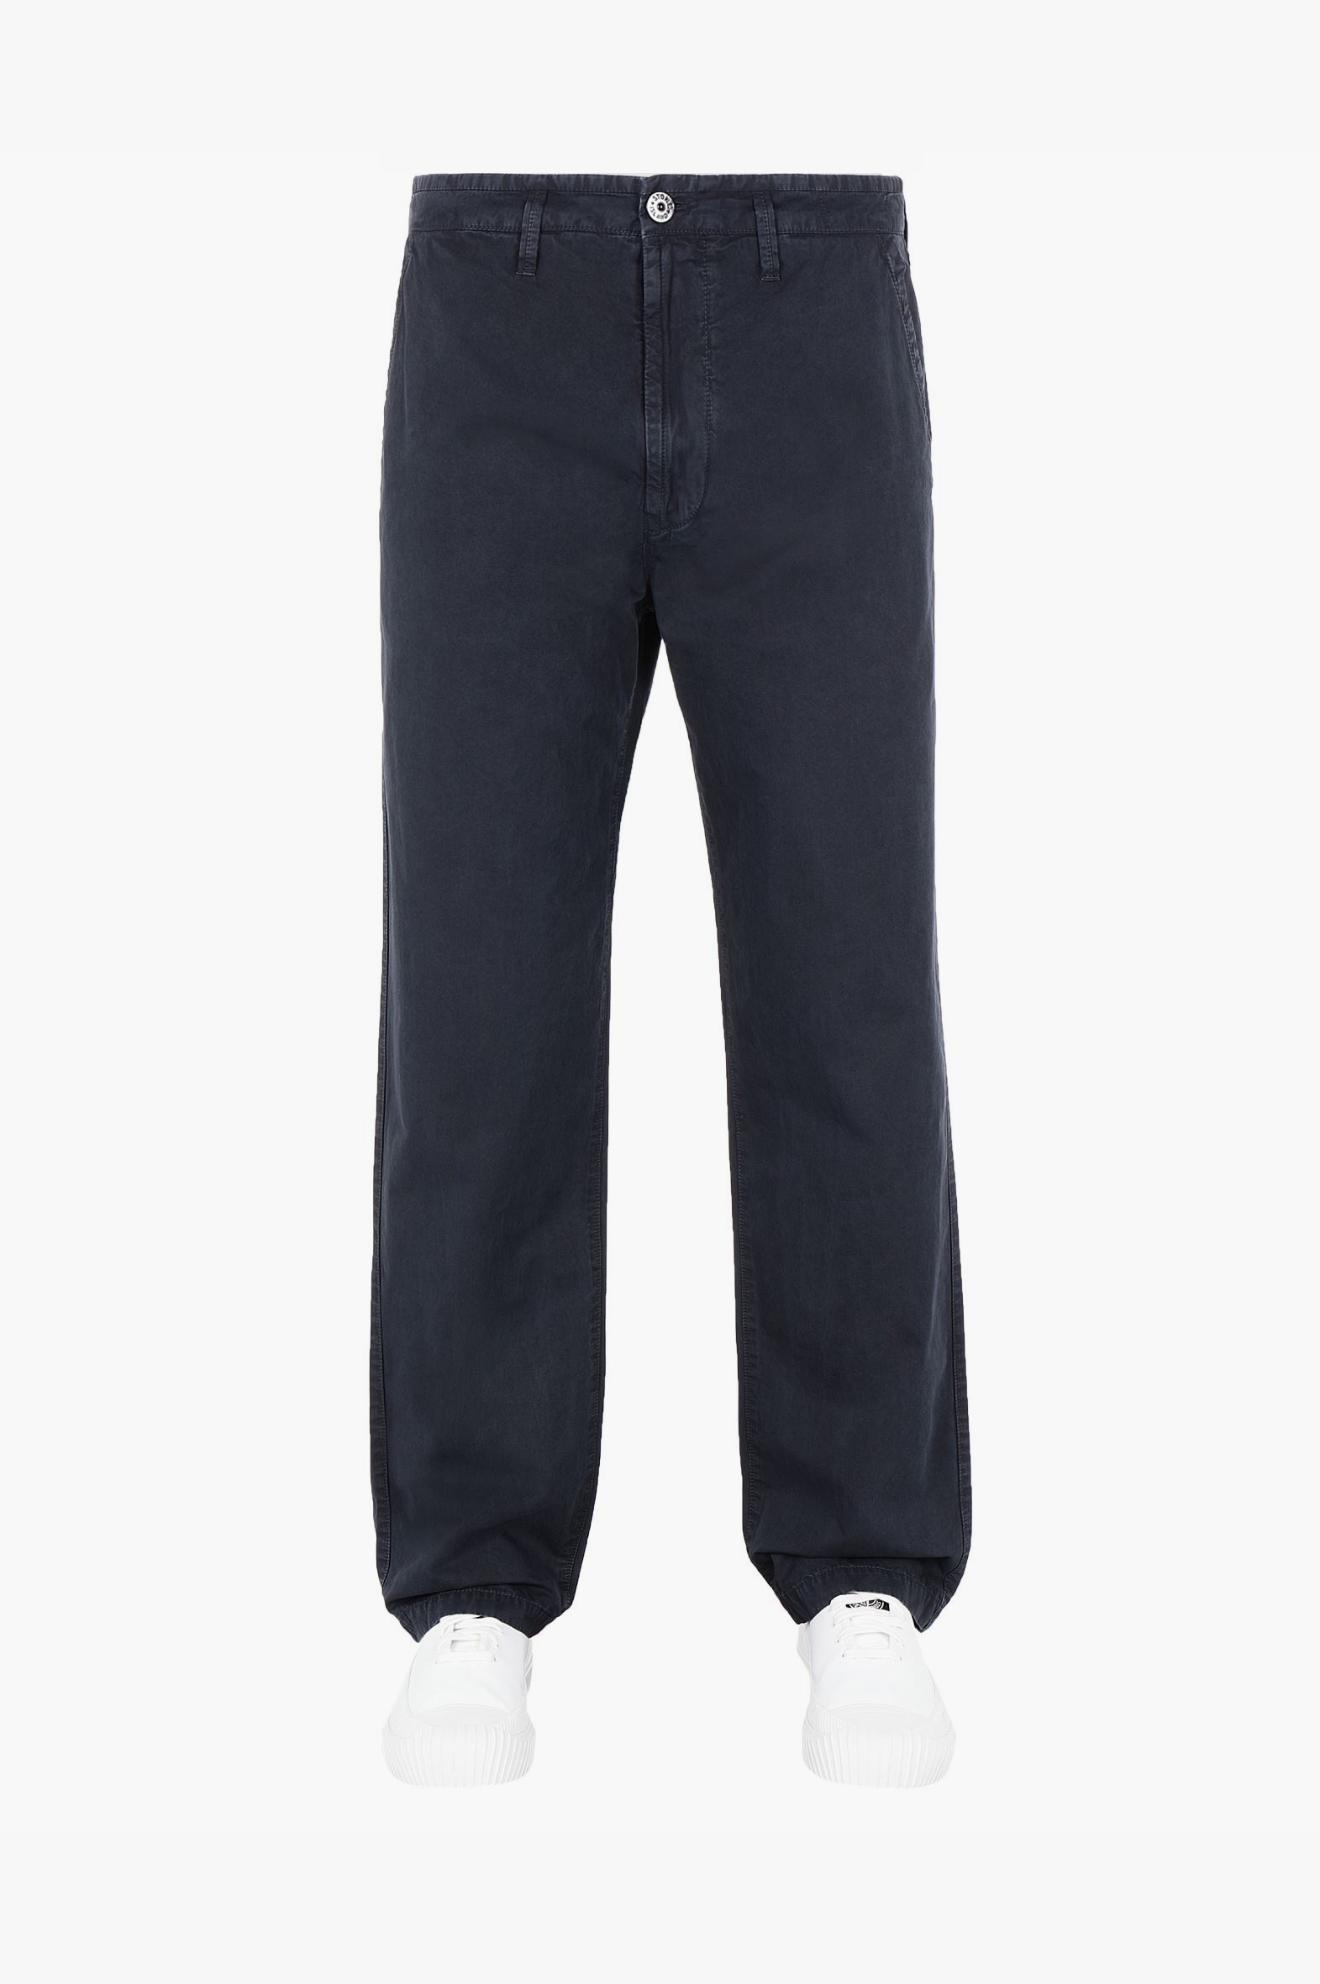 Chino Pants Navy Blue